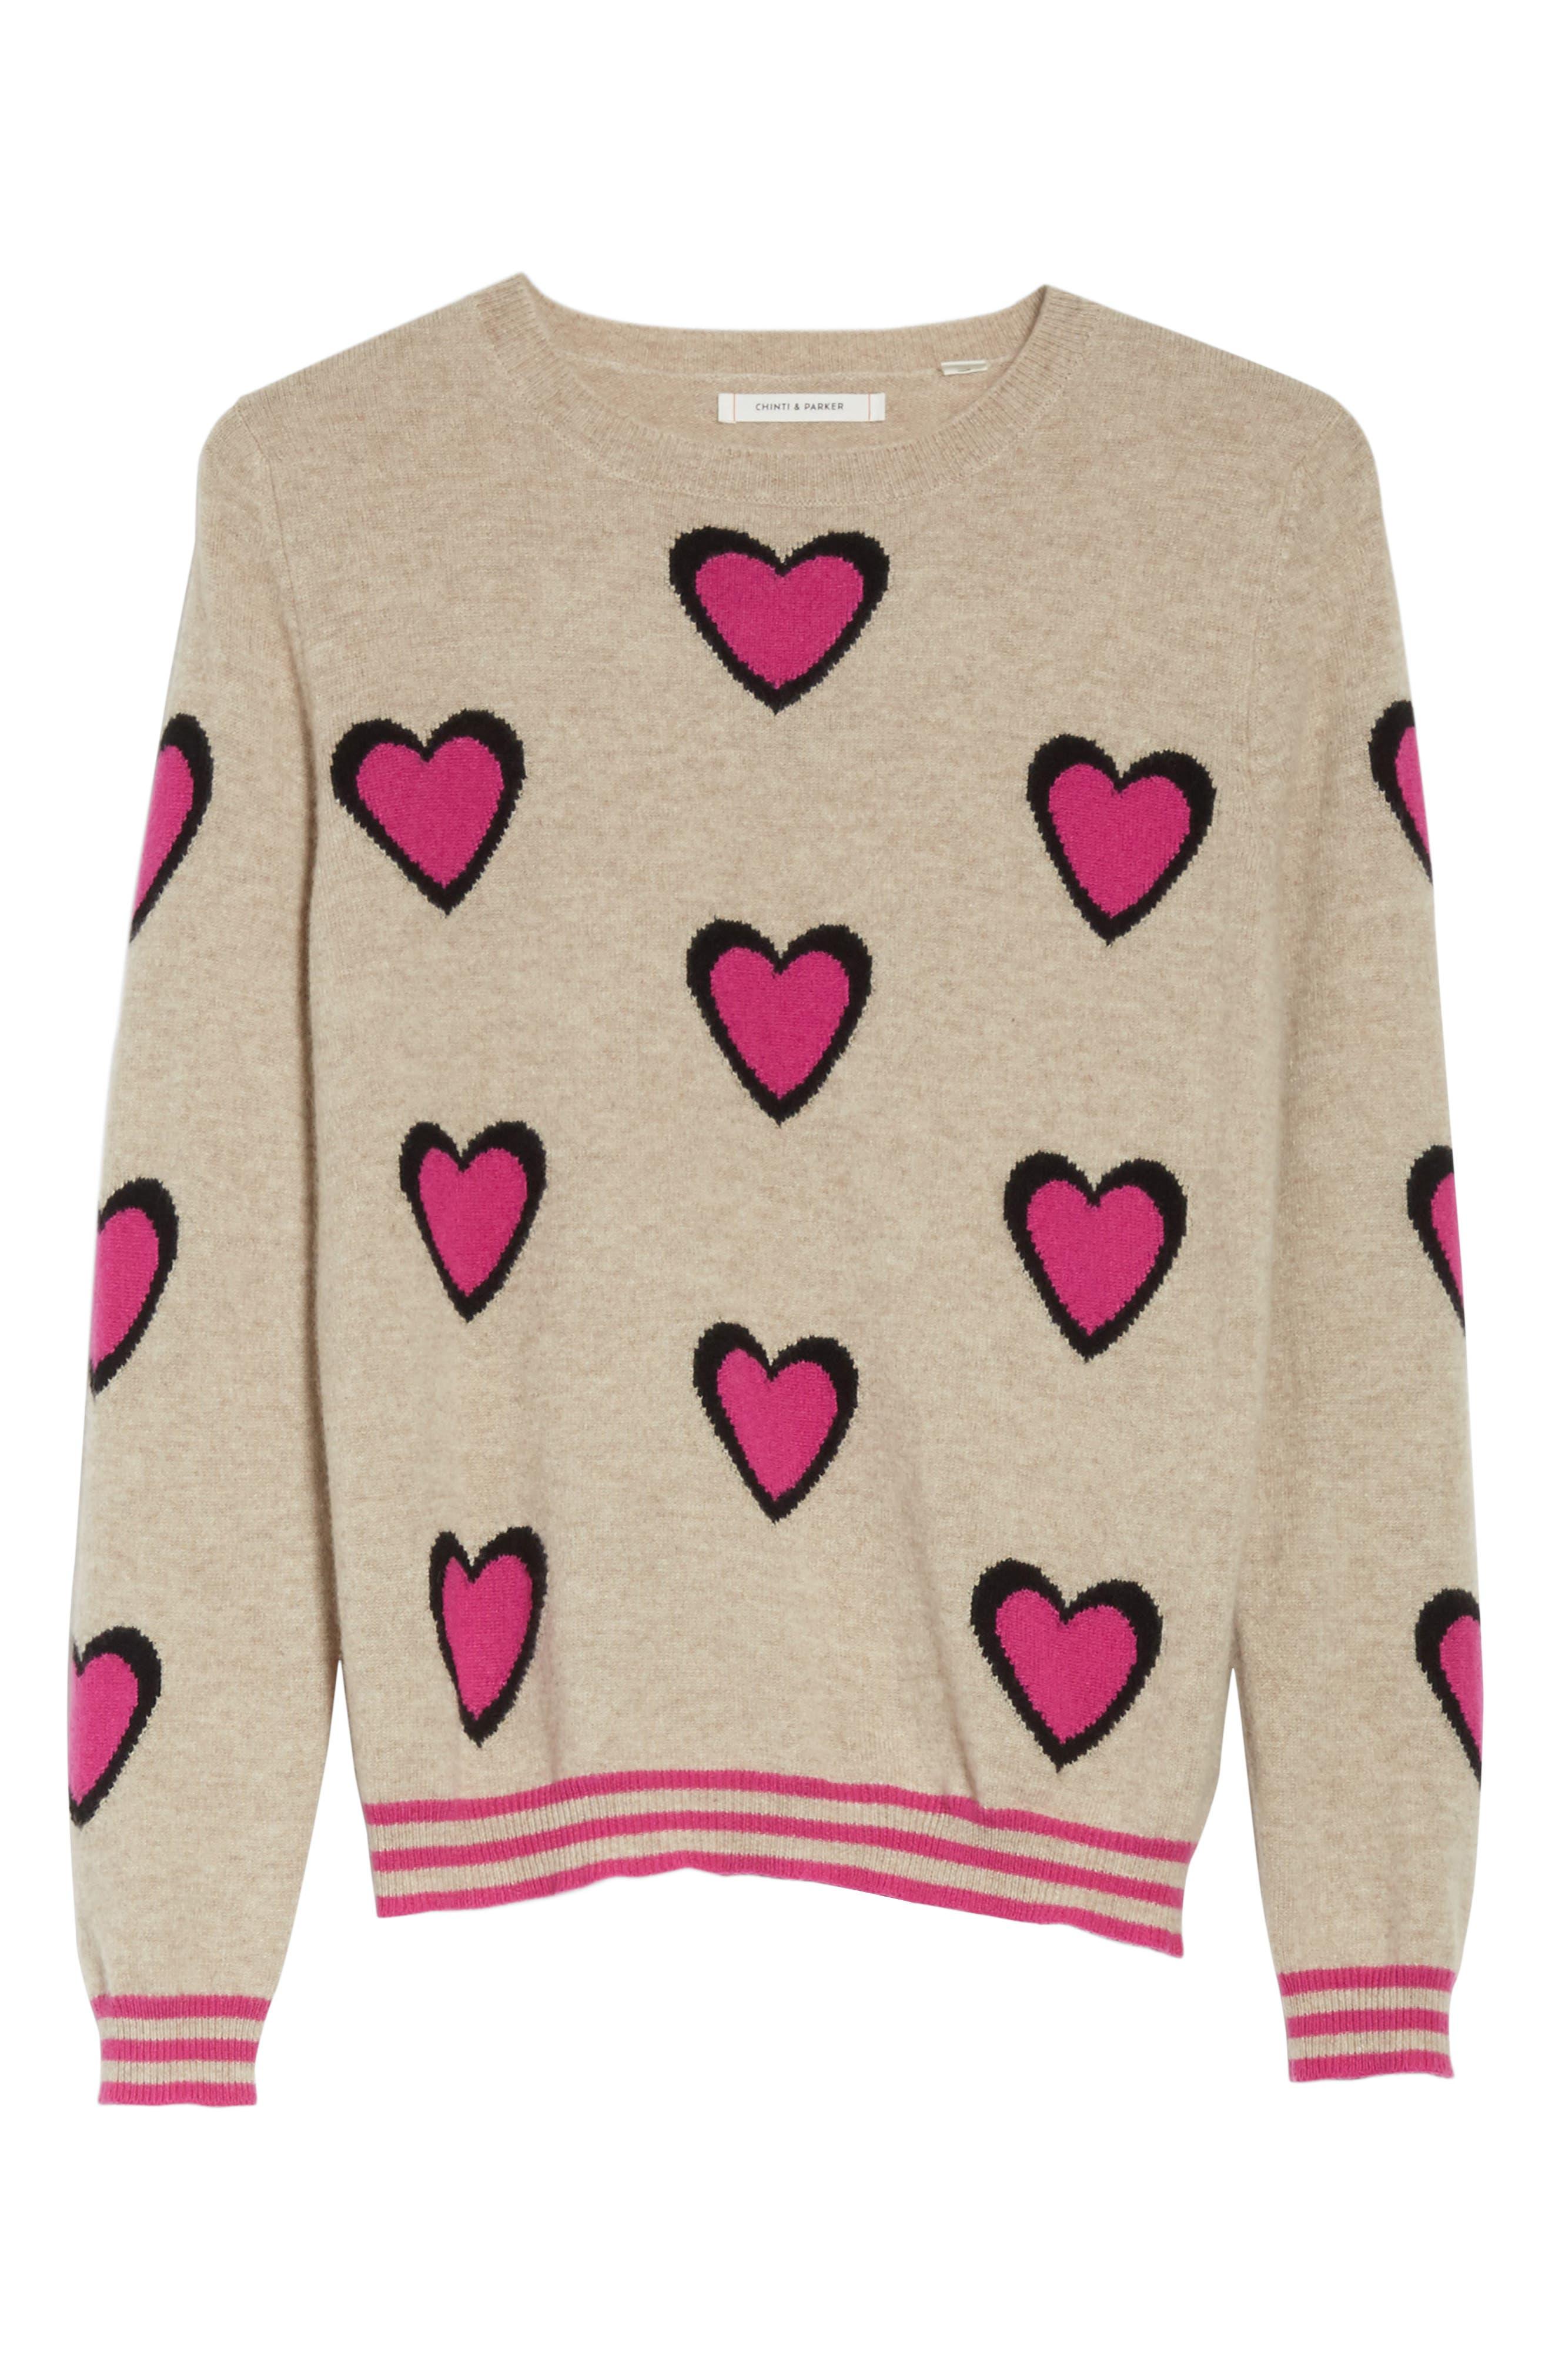 CHINTI & PARKER Heart Burst Cashmere Sweater,                             Alternate thumbnail 6, color,                             250